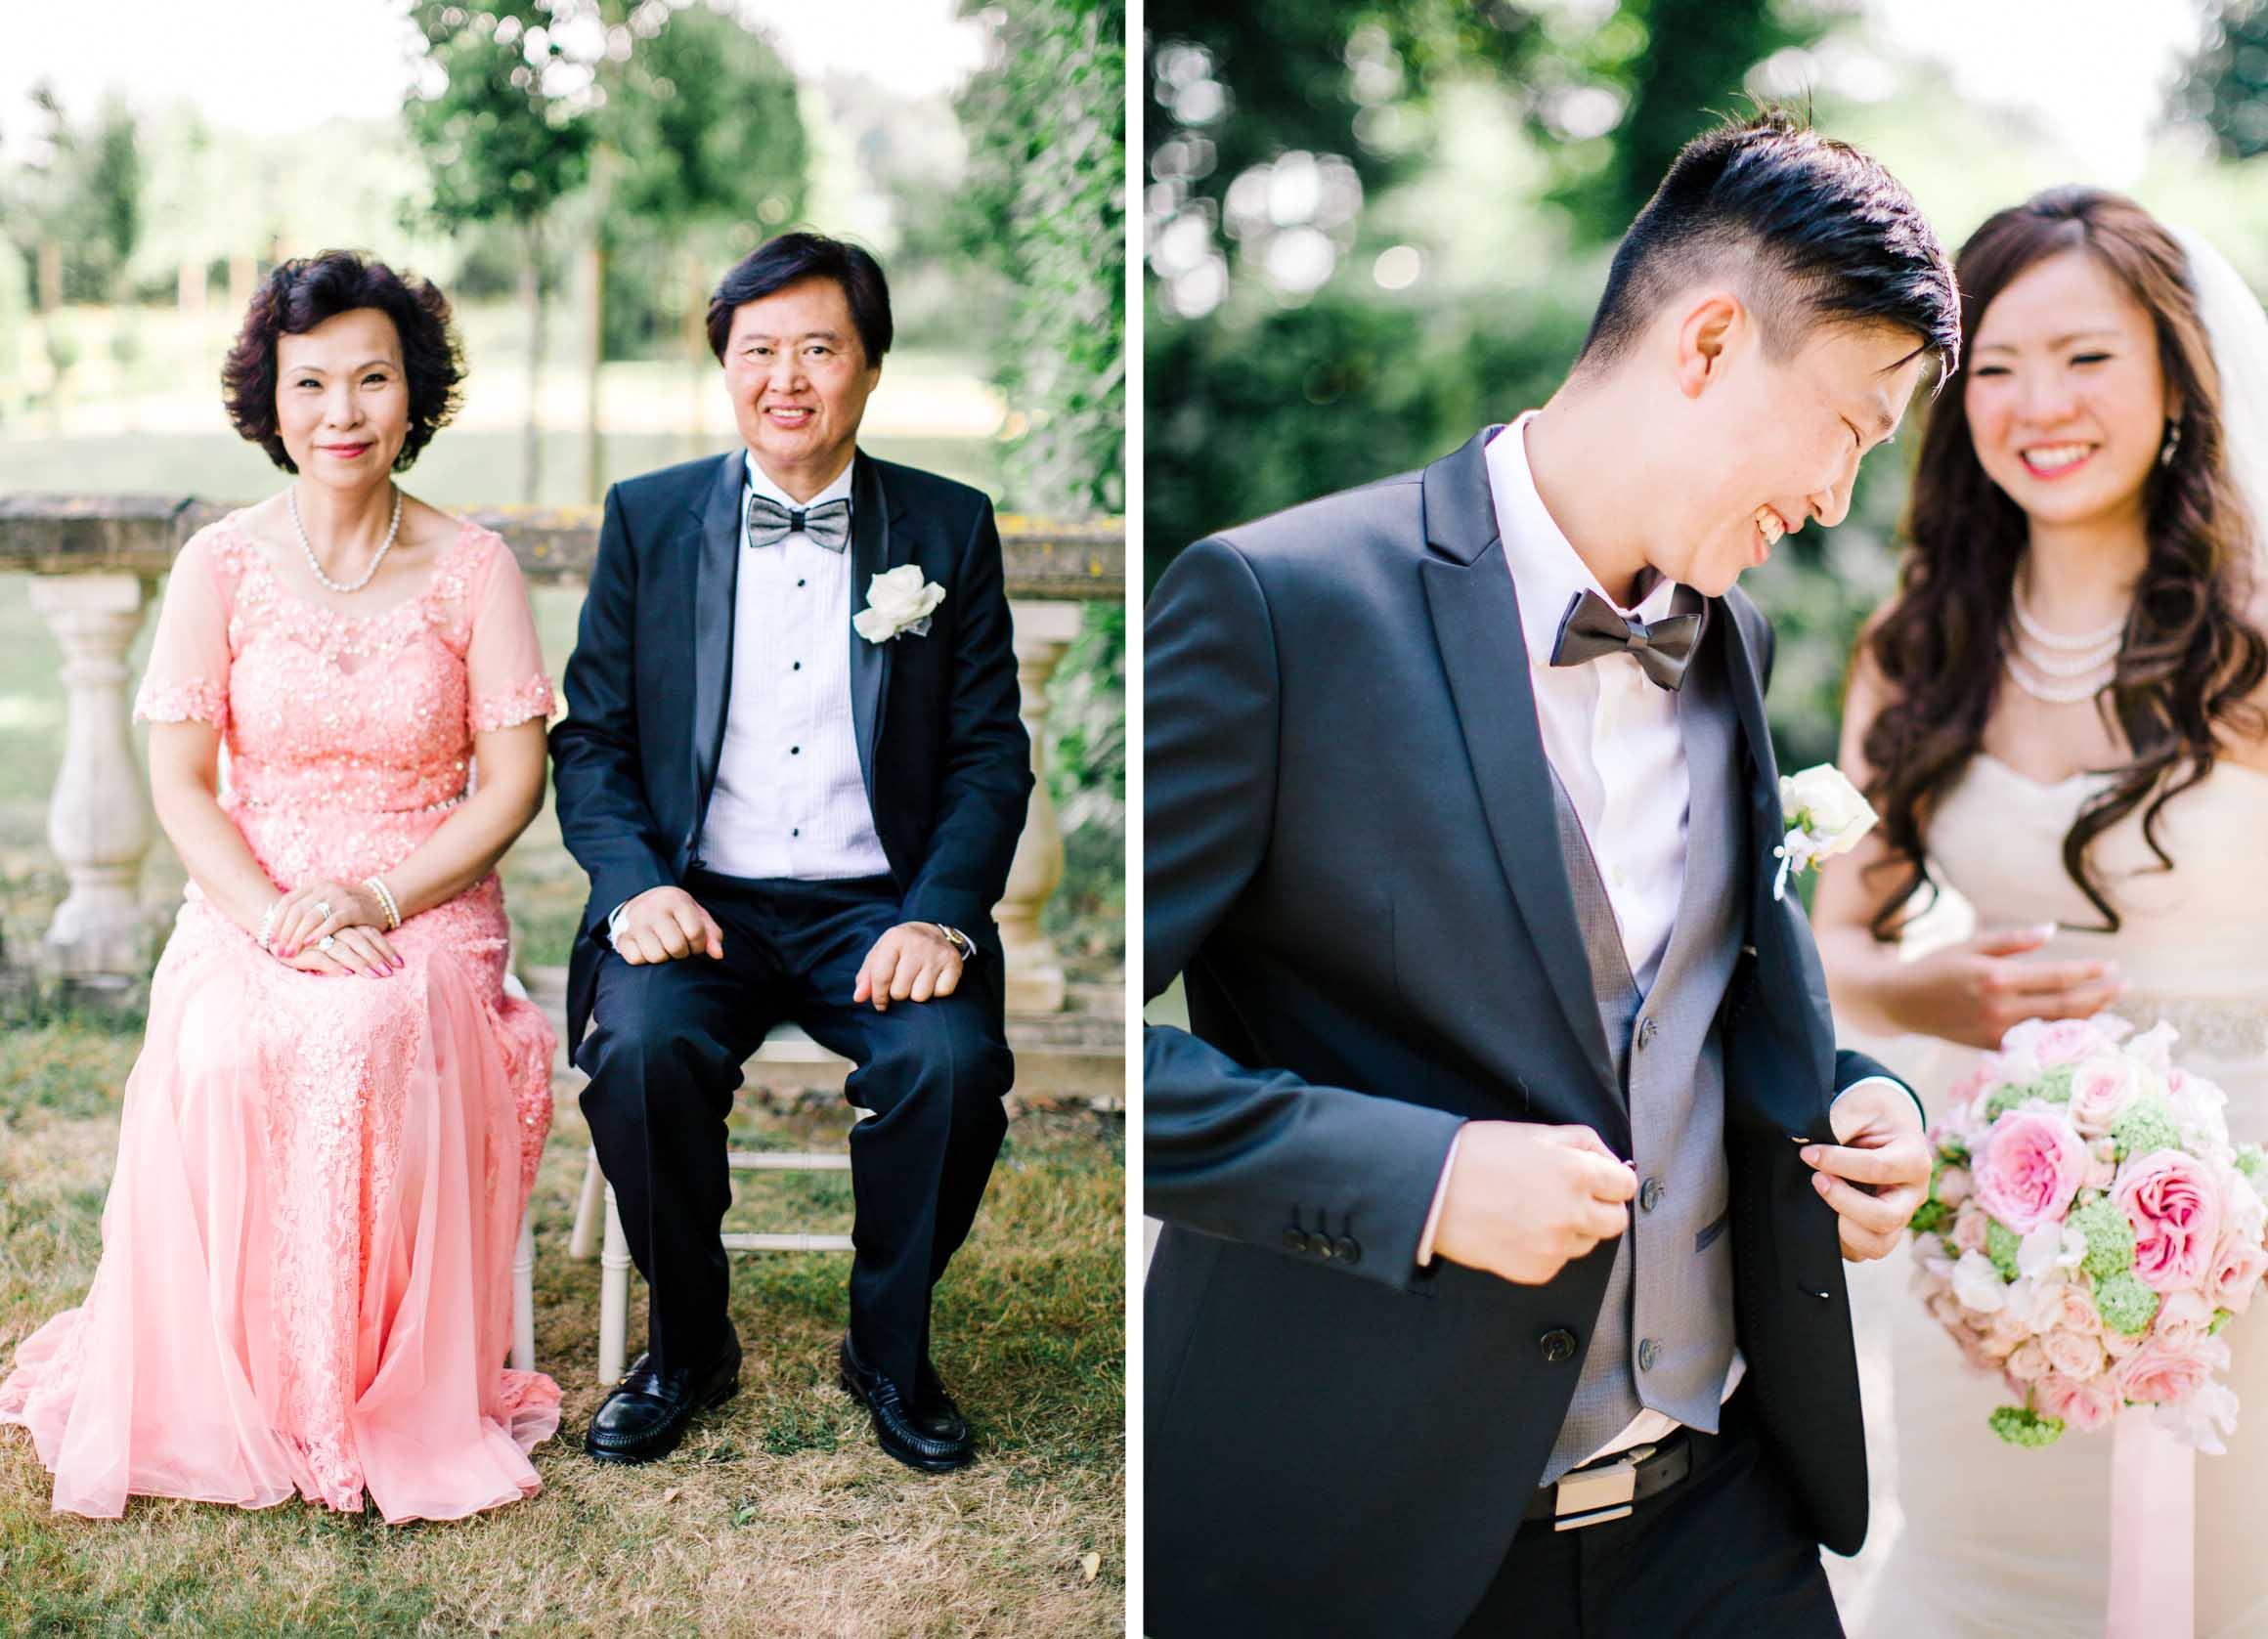 Amy O'Boyle Photography- Destination & UK Fine Art Film Wedding Photographer- Chateau La Durantie Wedding 9.jpg